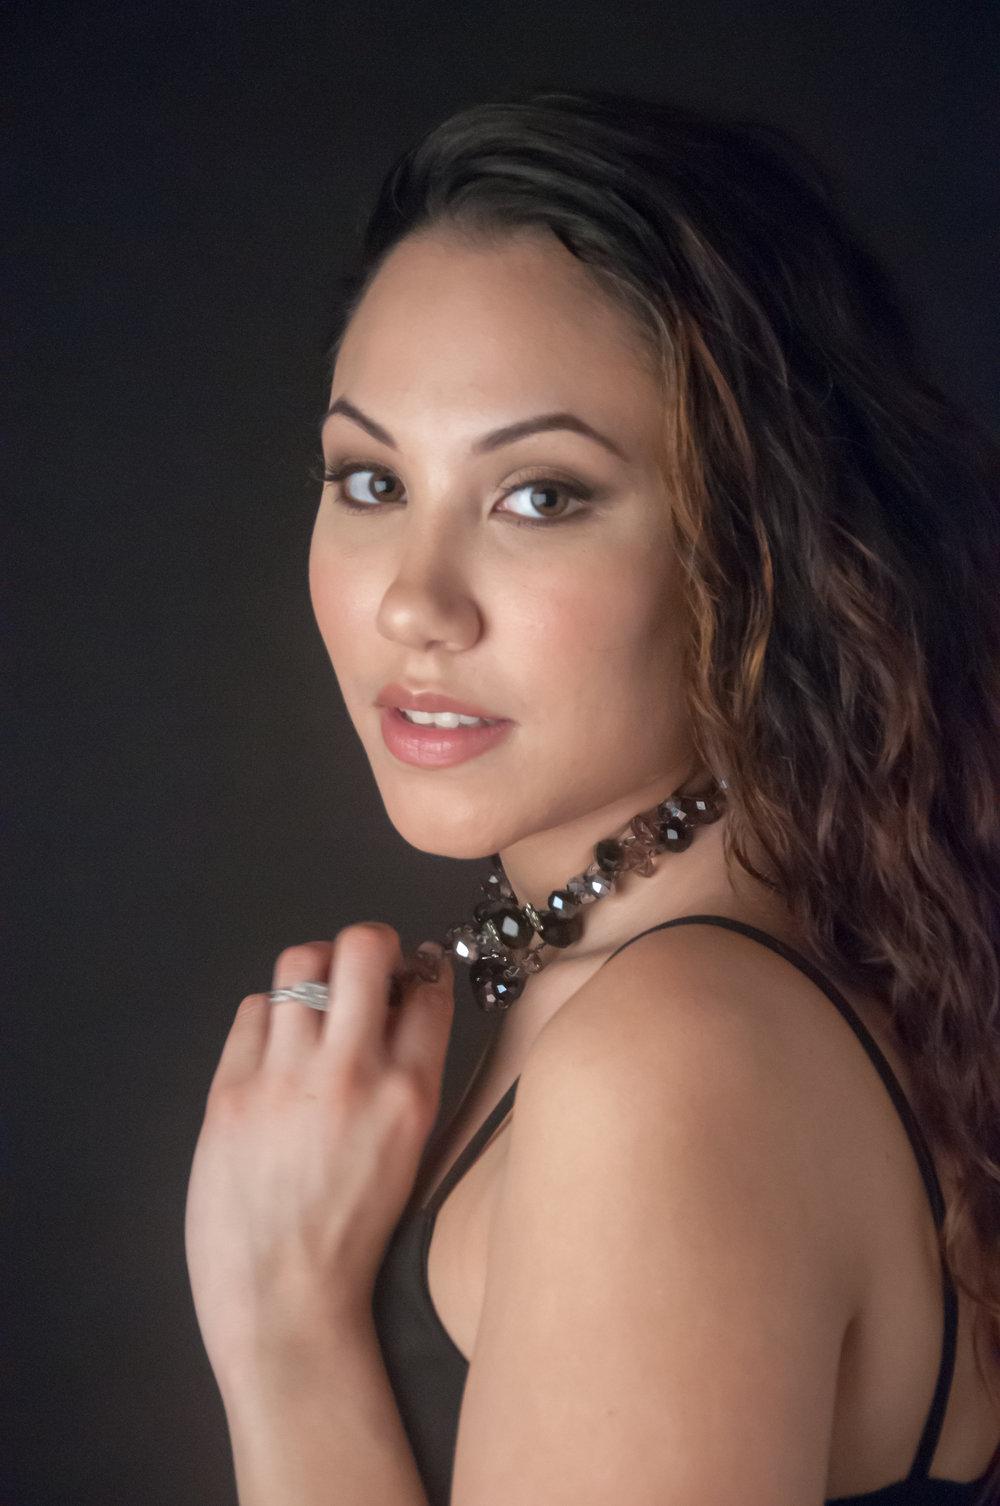 CarrieAnneGonzalez_NYPhotography_CarrieWestonStudios_Portrait-5043.jpg